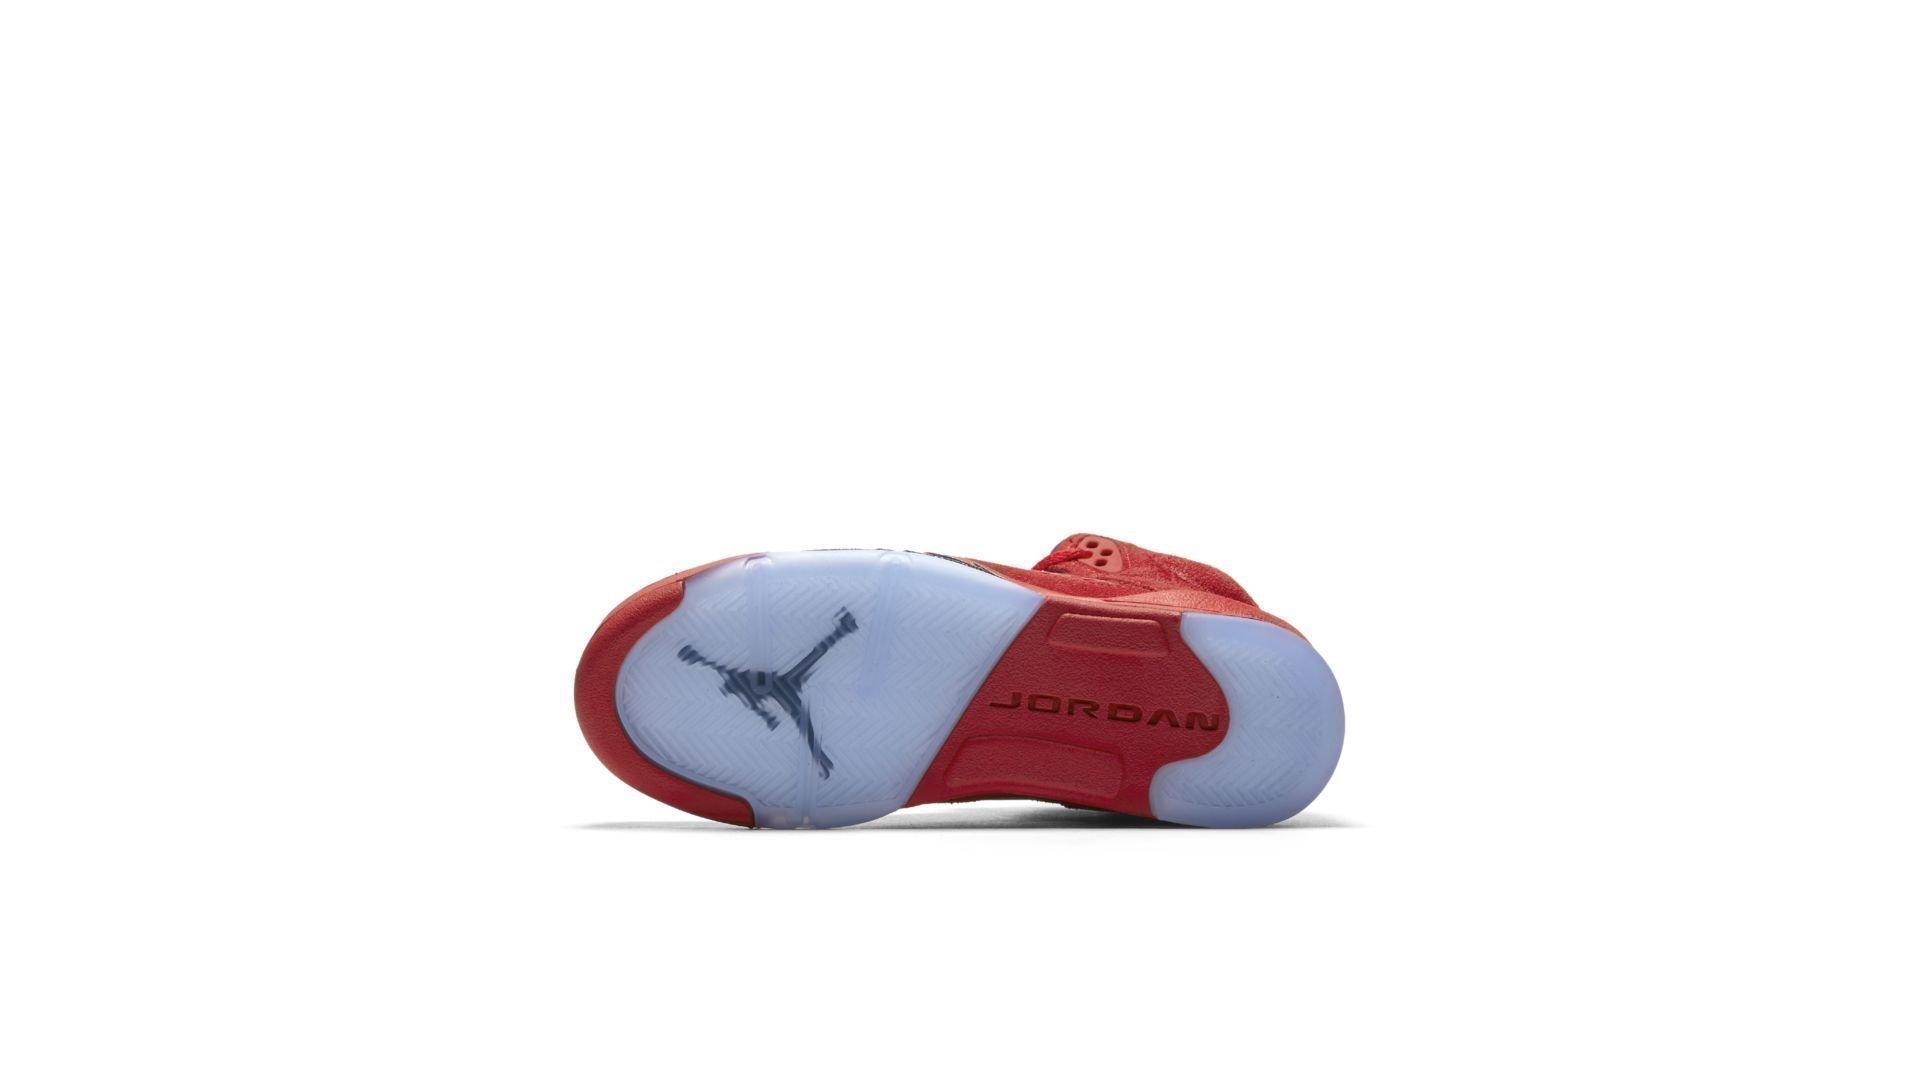 Jordan 5 Retro Red Suede (GS) (440888-602)